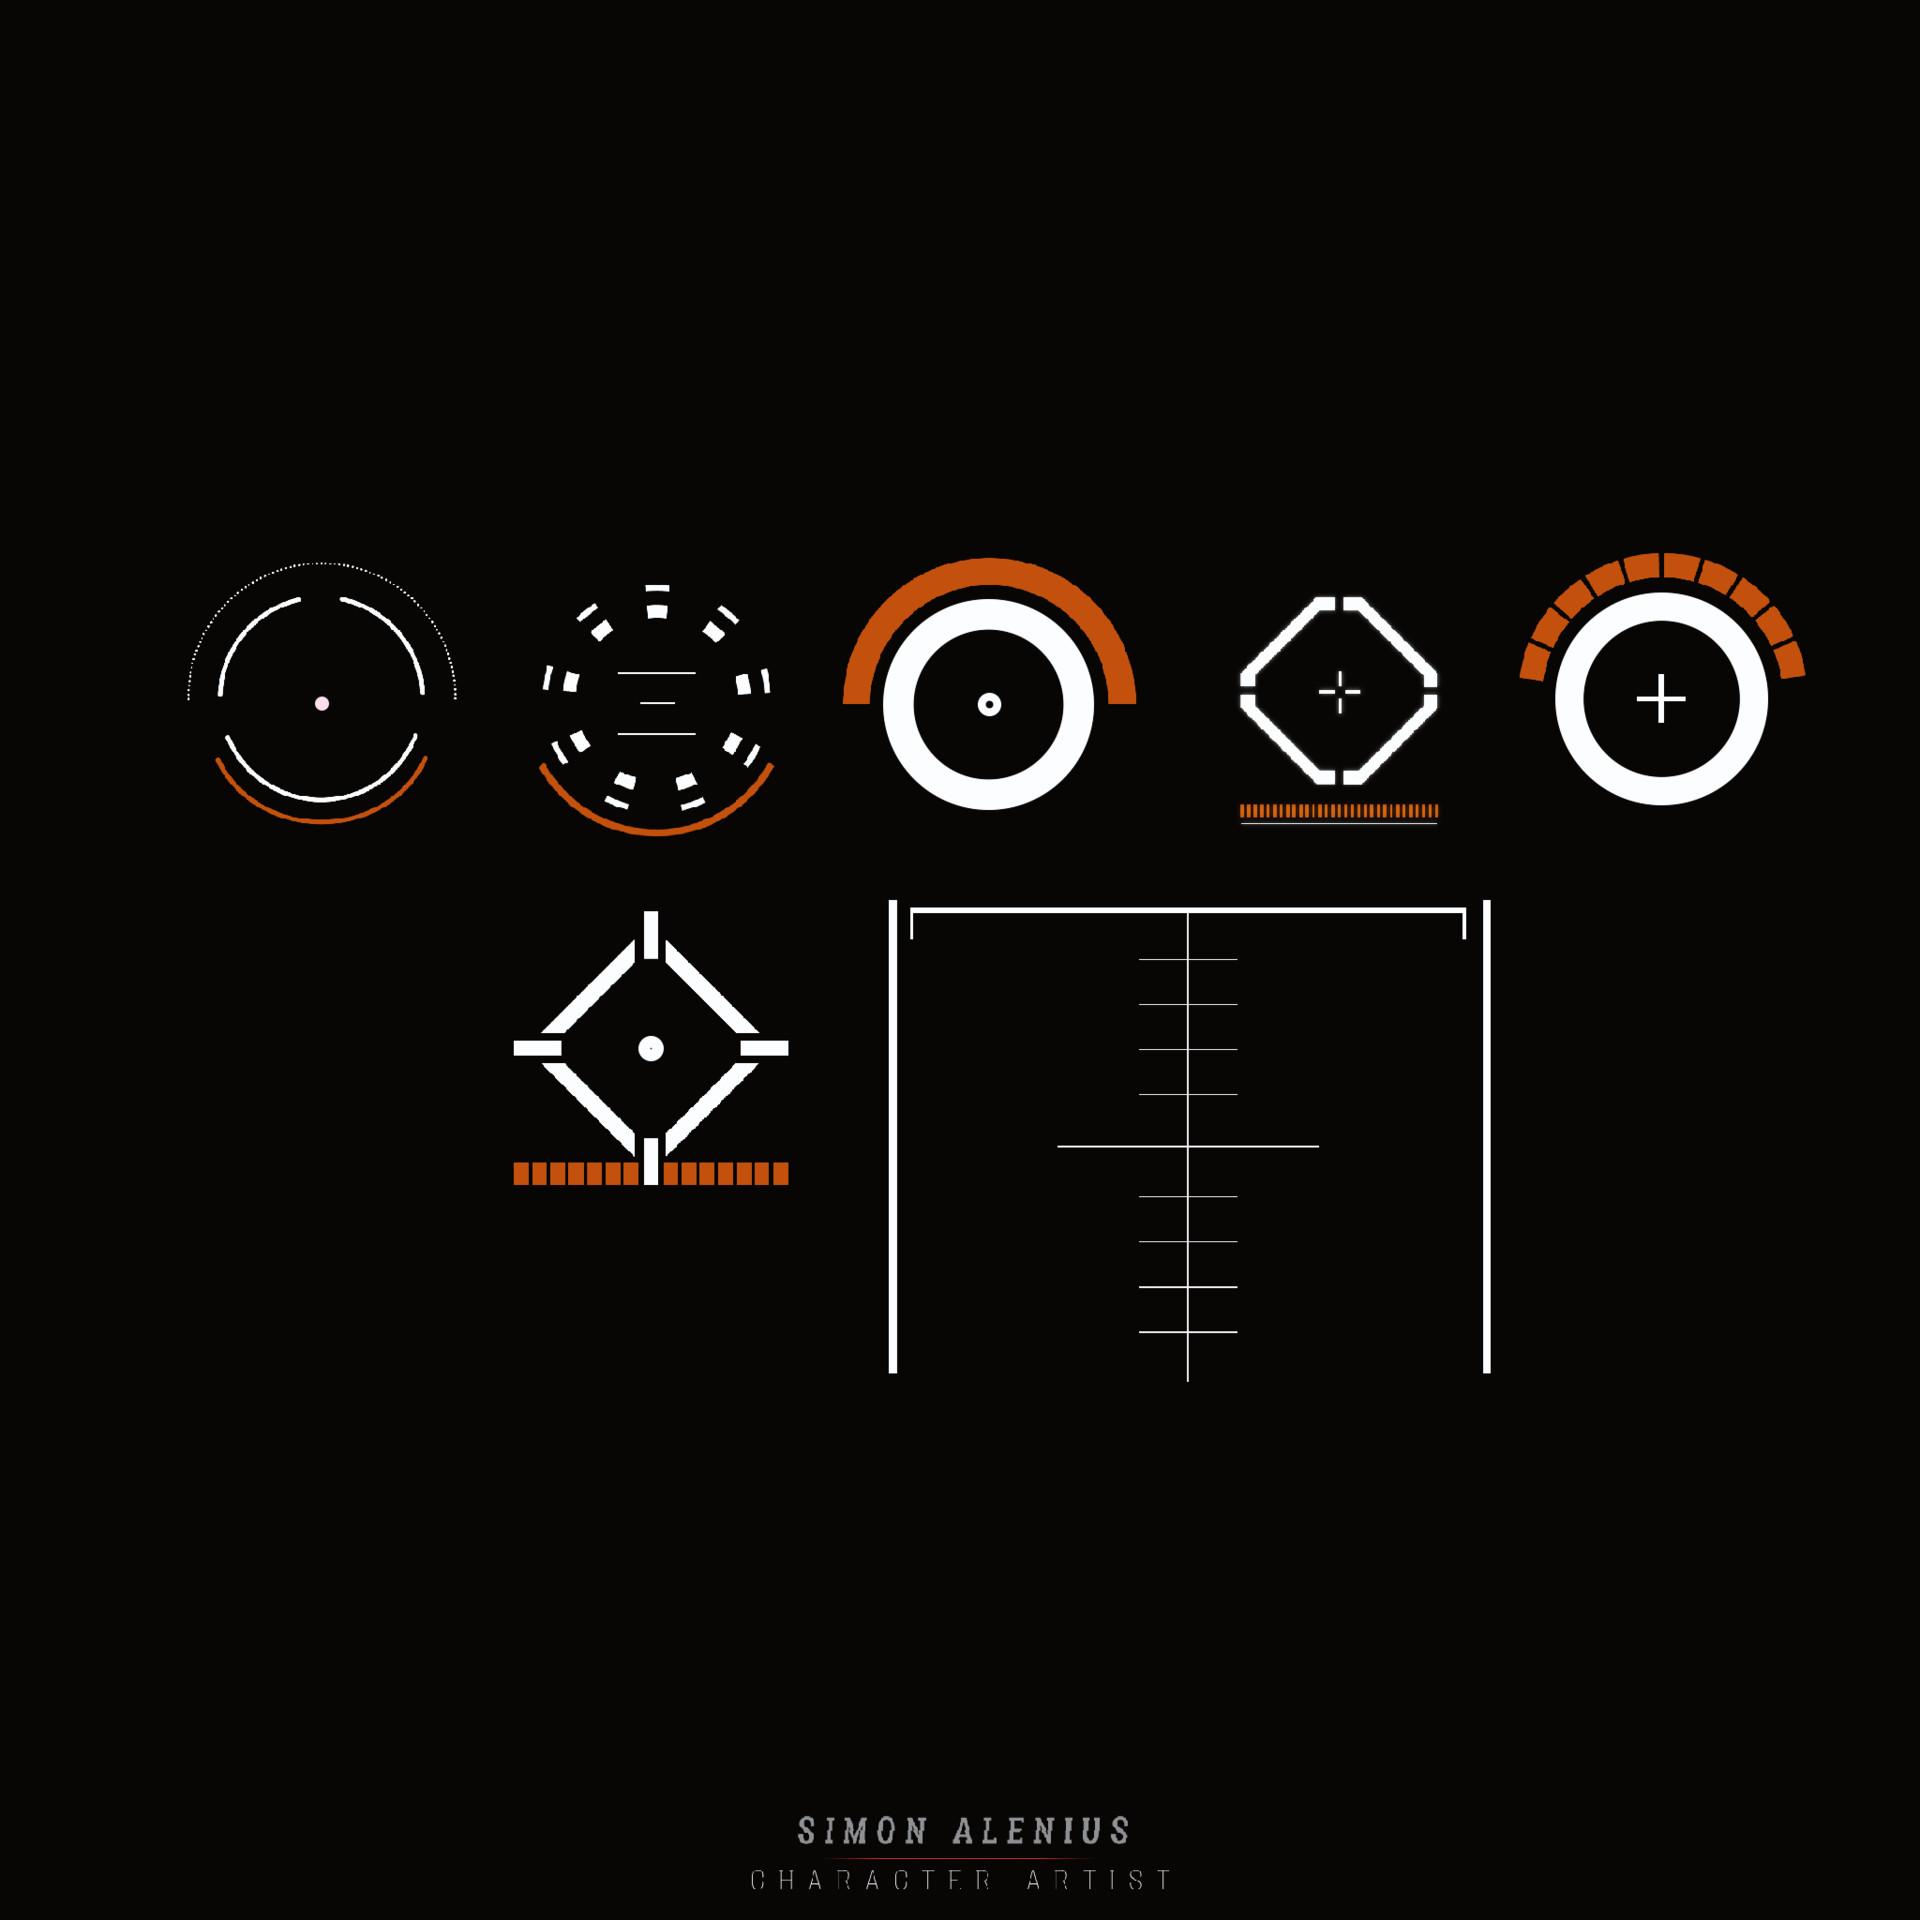 Simon alenius crosshairs 01